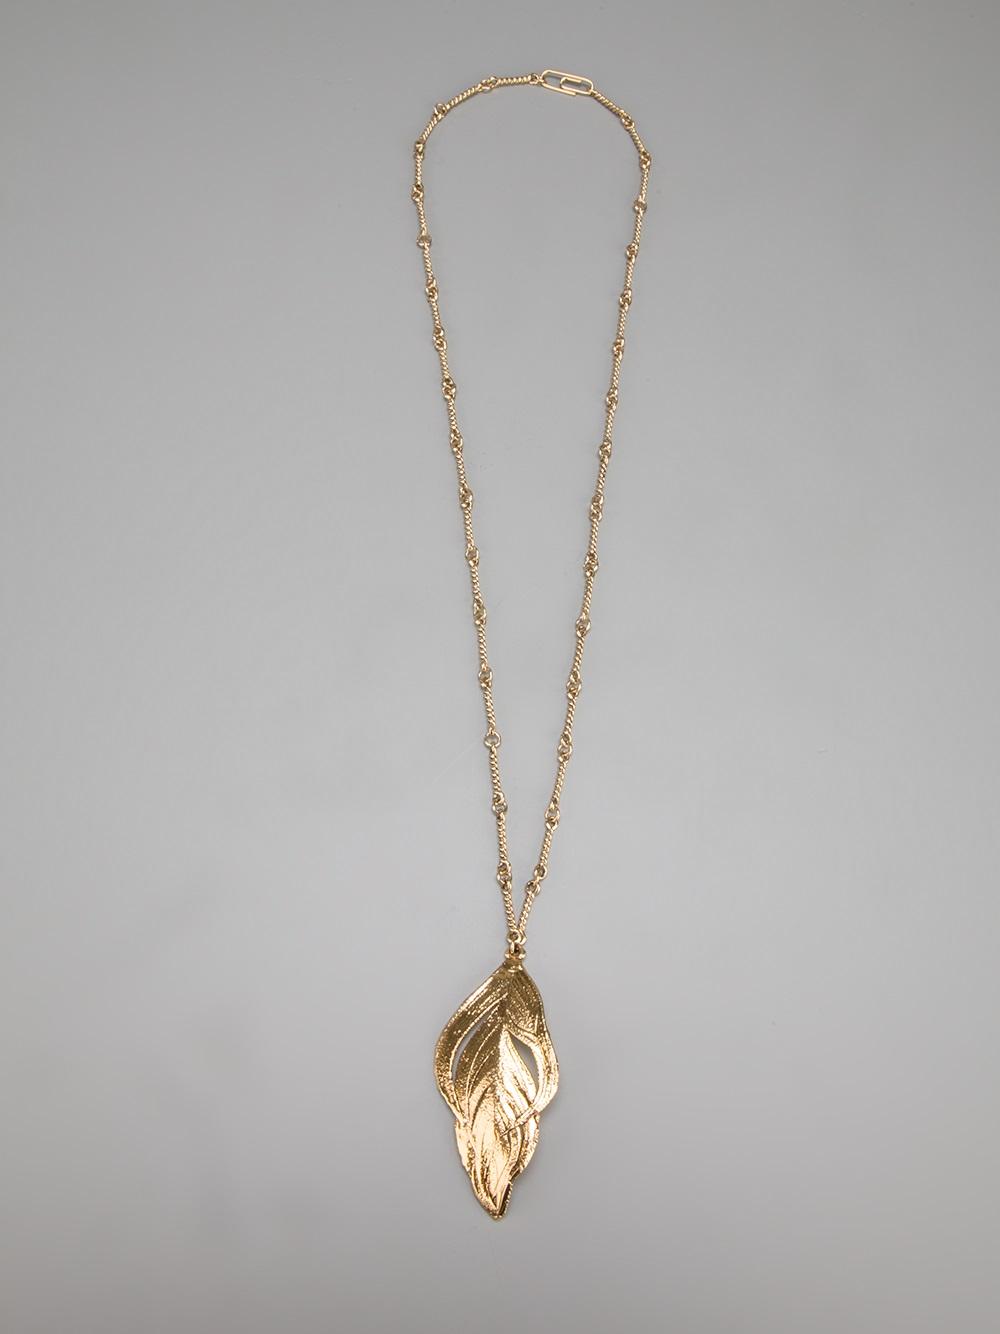 Aurelie bidermann Feather Pendant Necklace in Metallic